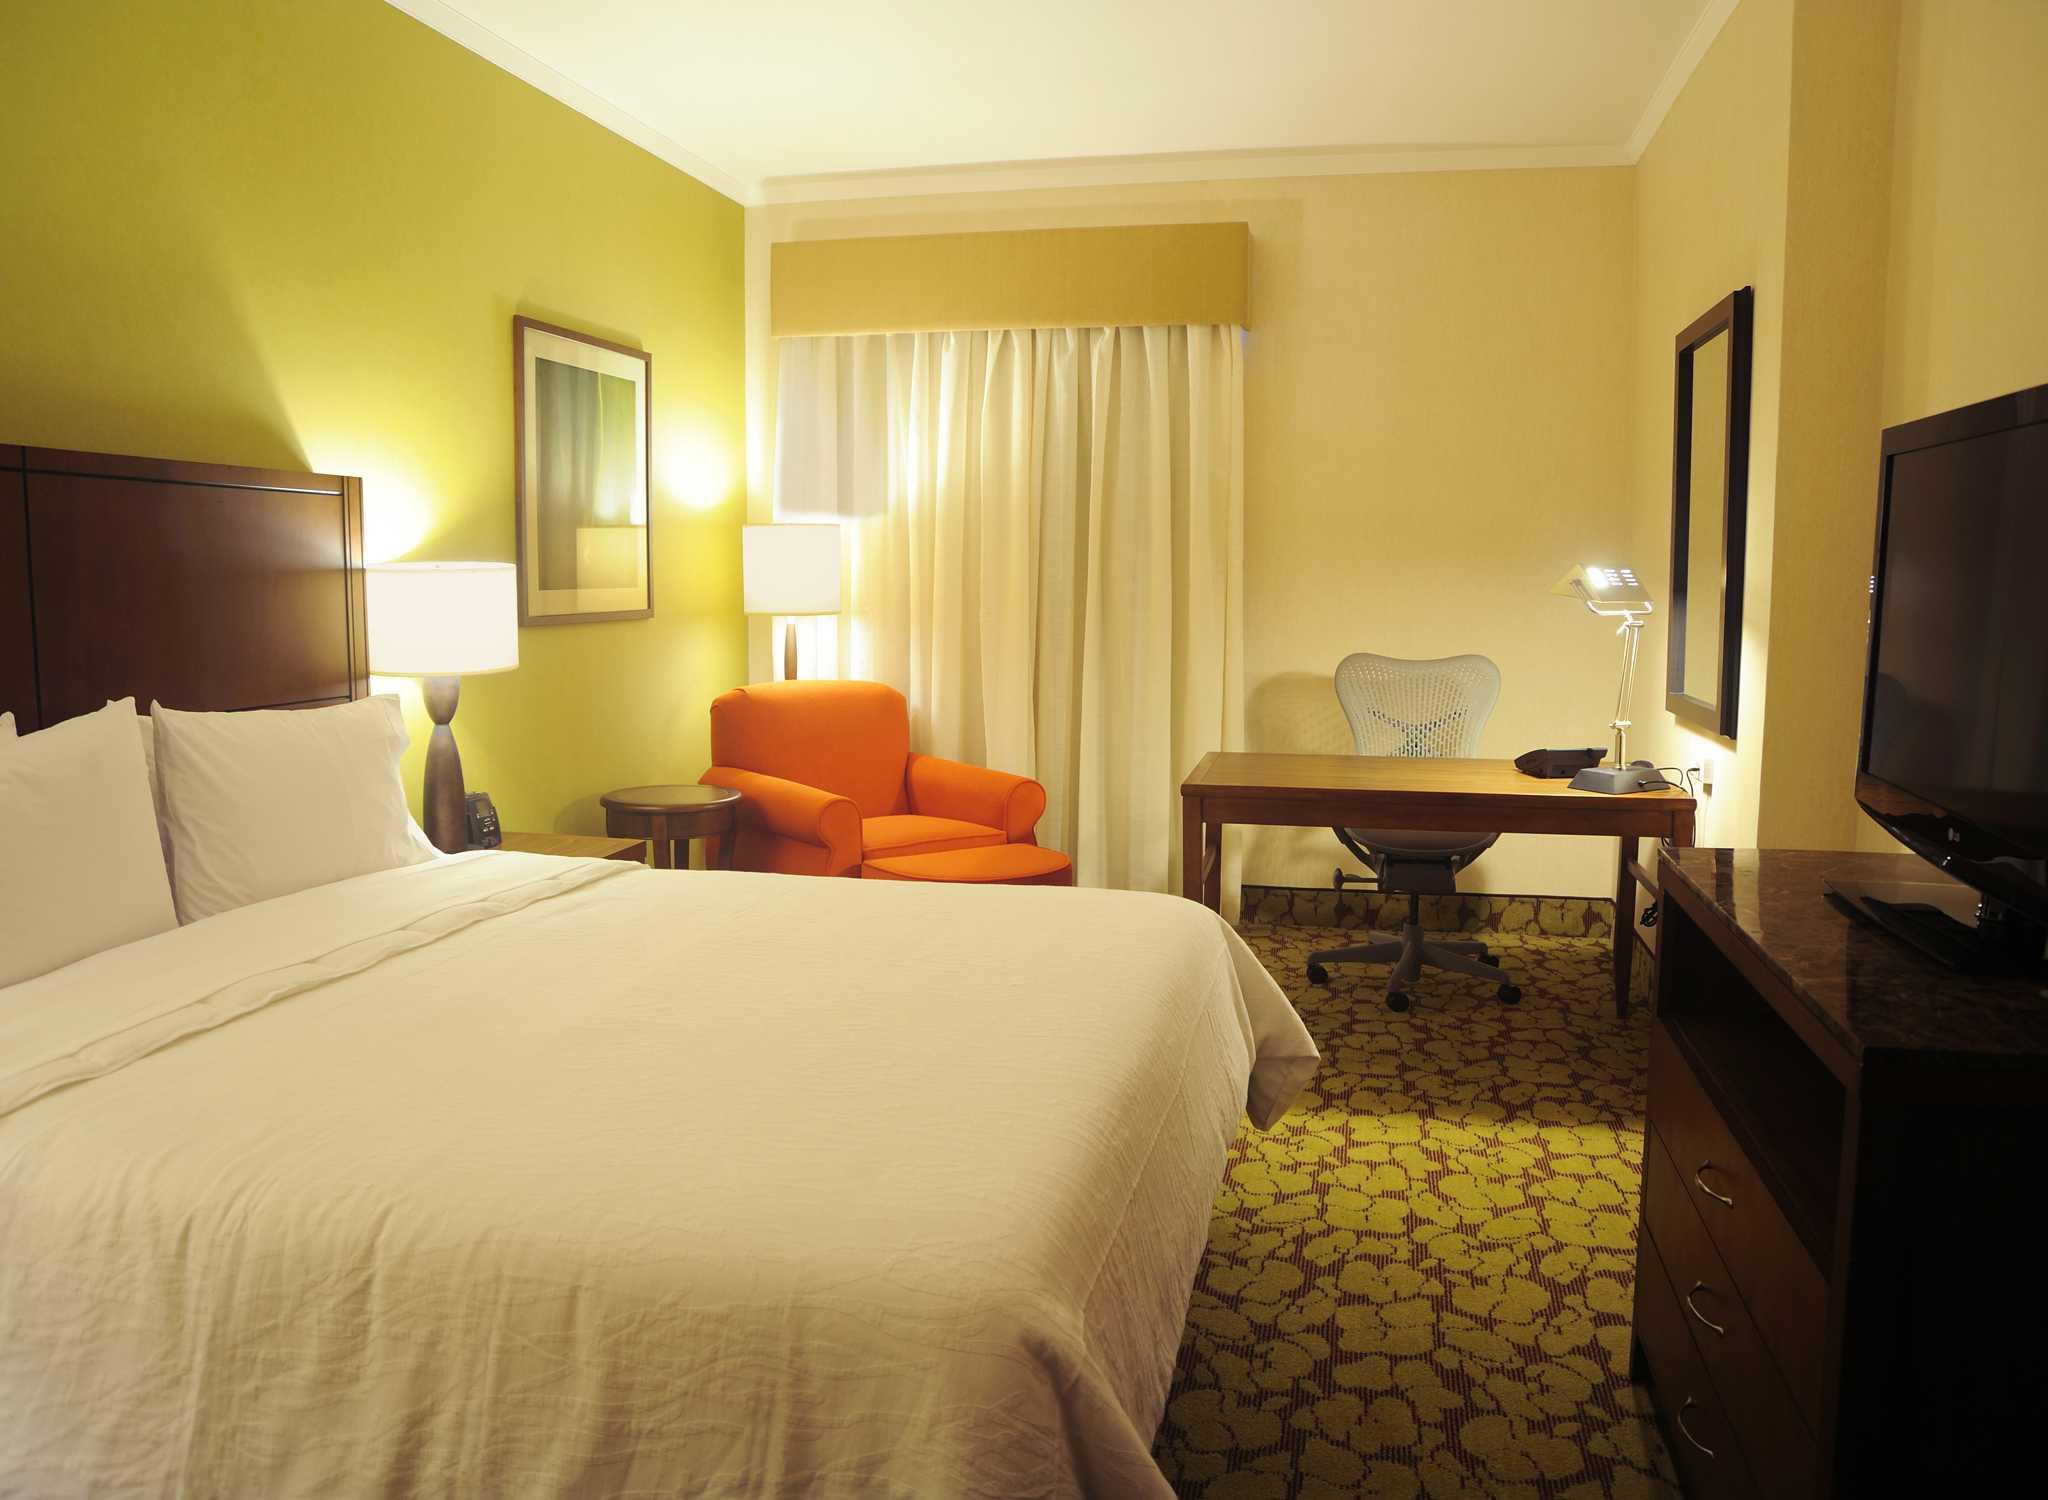 Panama City Beach Hotels Hilton Garden Inn